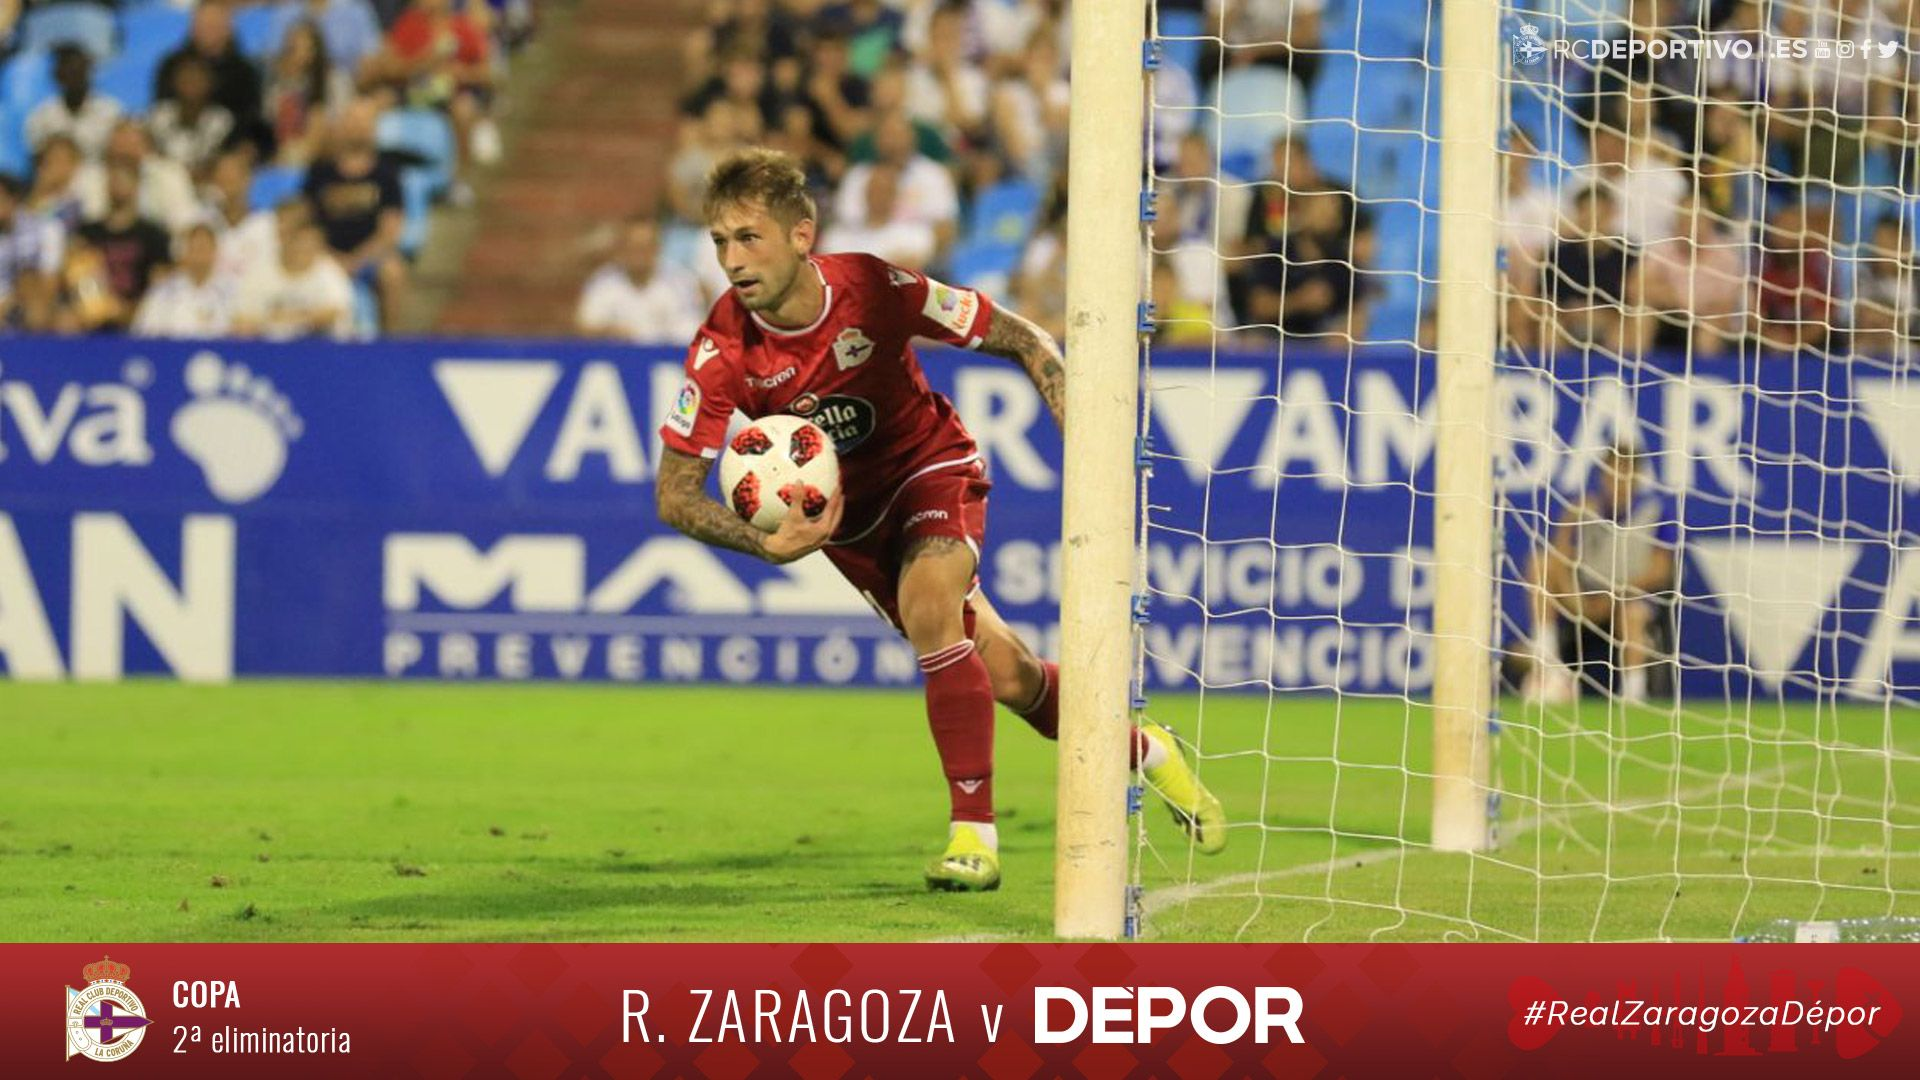 Vídeo resumen #ZaragozaDépor ya disponible en nuestra web: https://t.co/RHAWGLlRFL https://t.co/q4u5tFnB9y